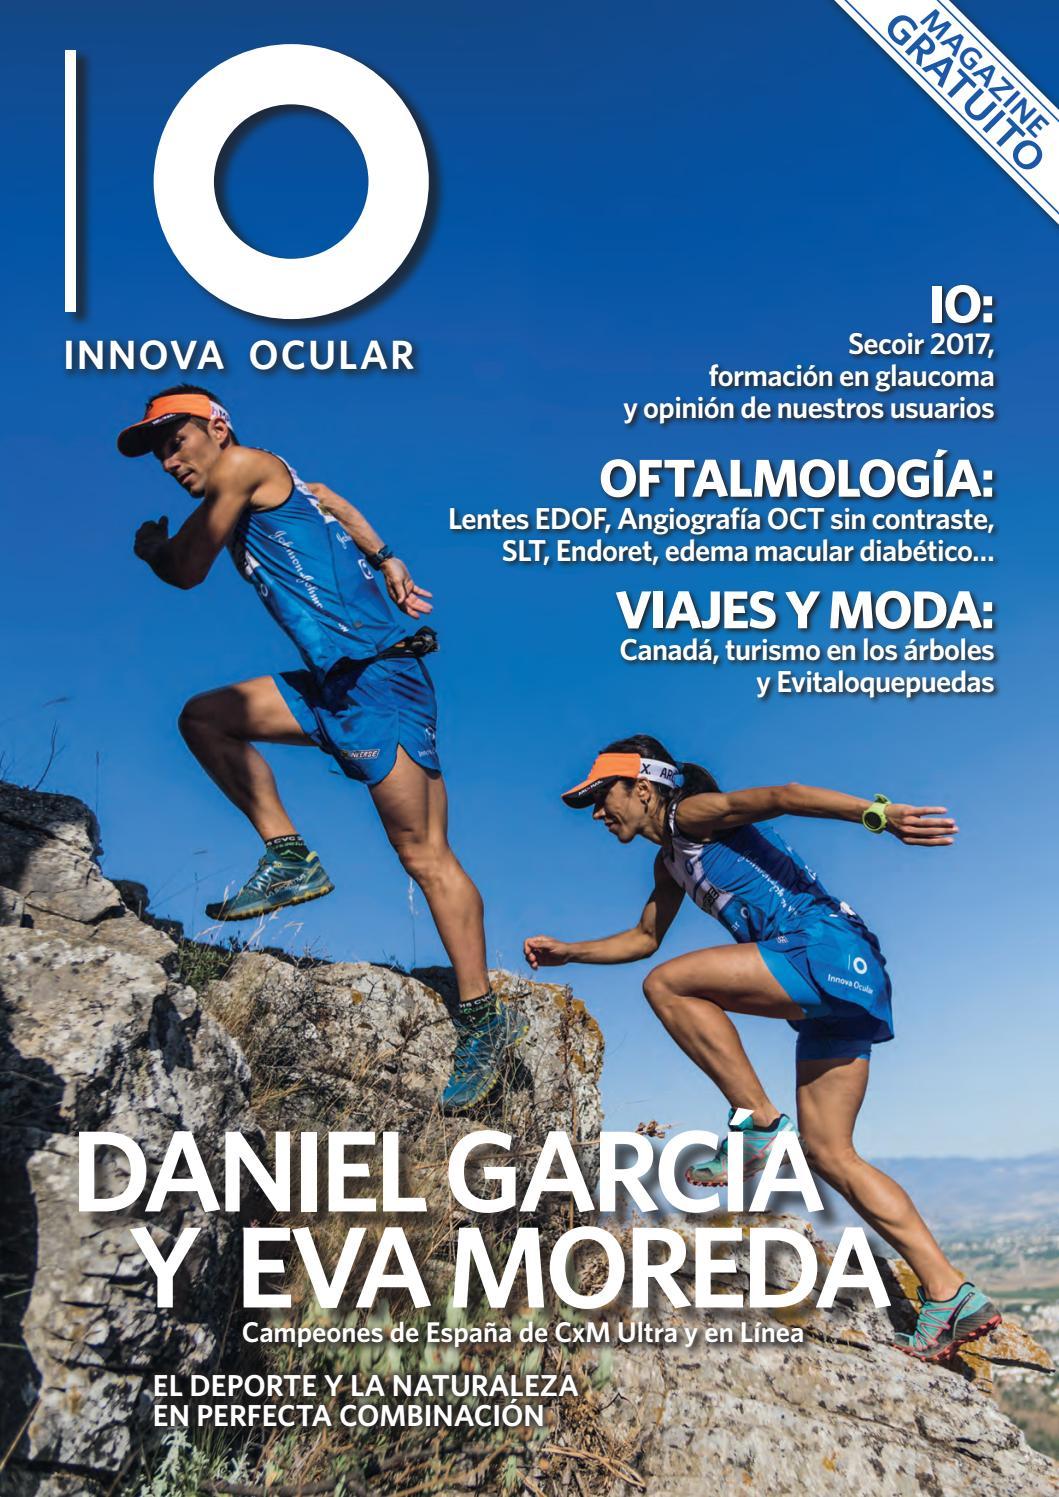 30624bd91e Revista Innova Ocular #26 by Clínica Oftalmológica Dr. Soler - issuu